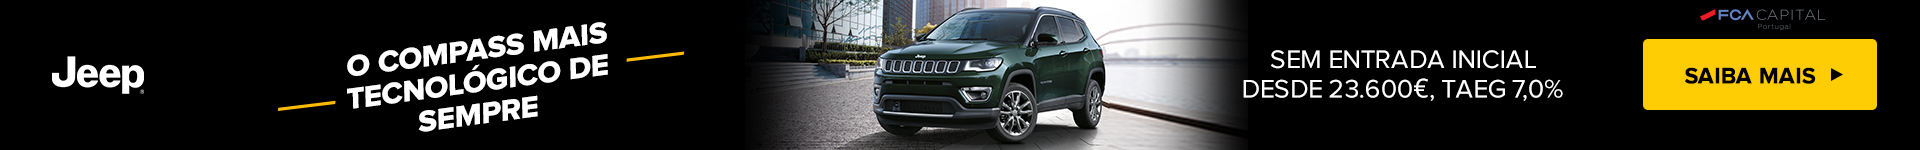 Jeep Header 2020